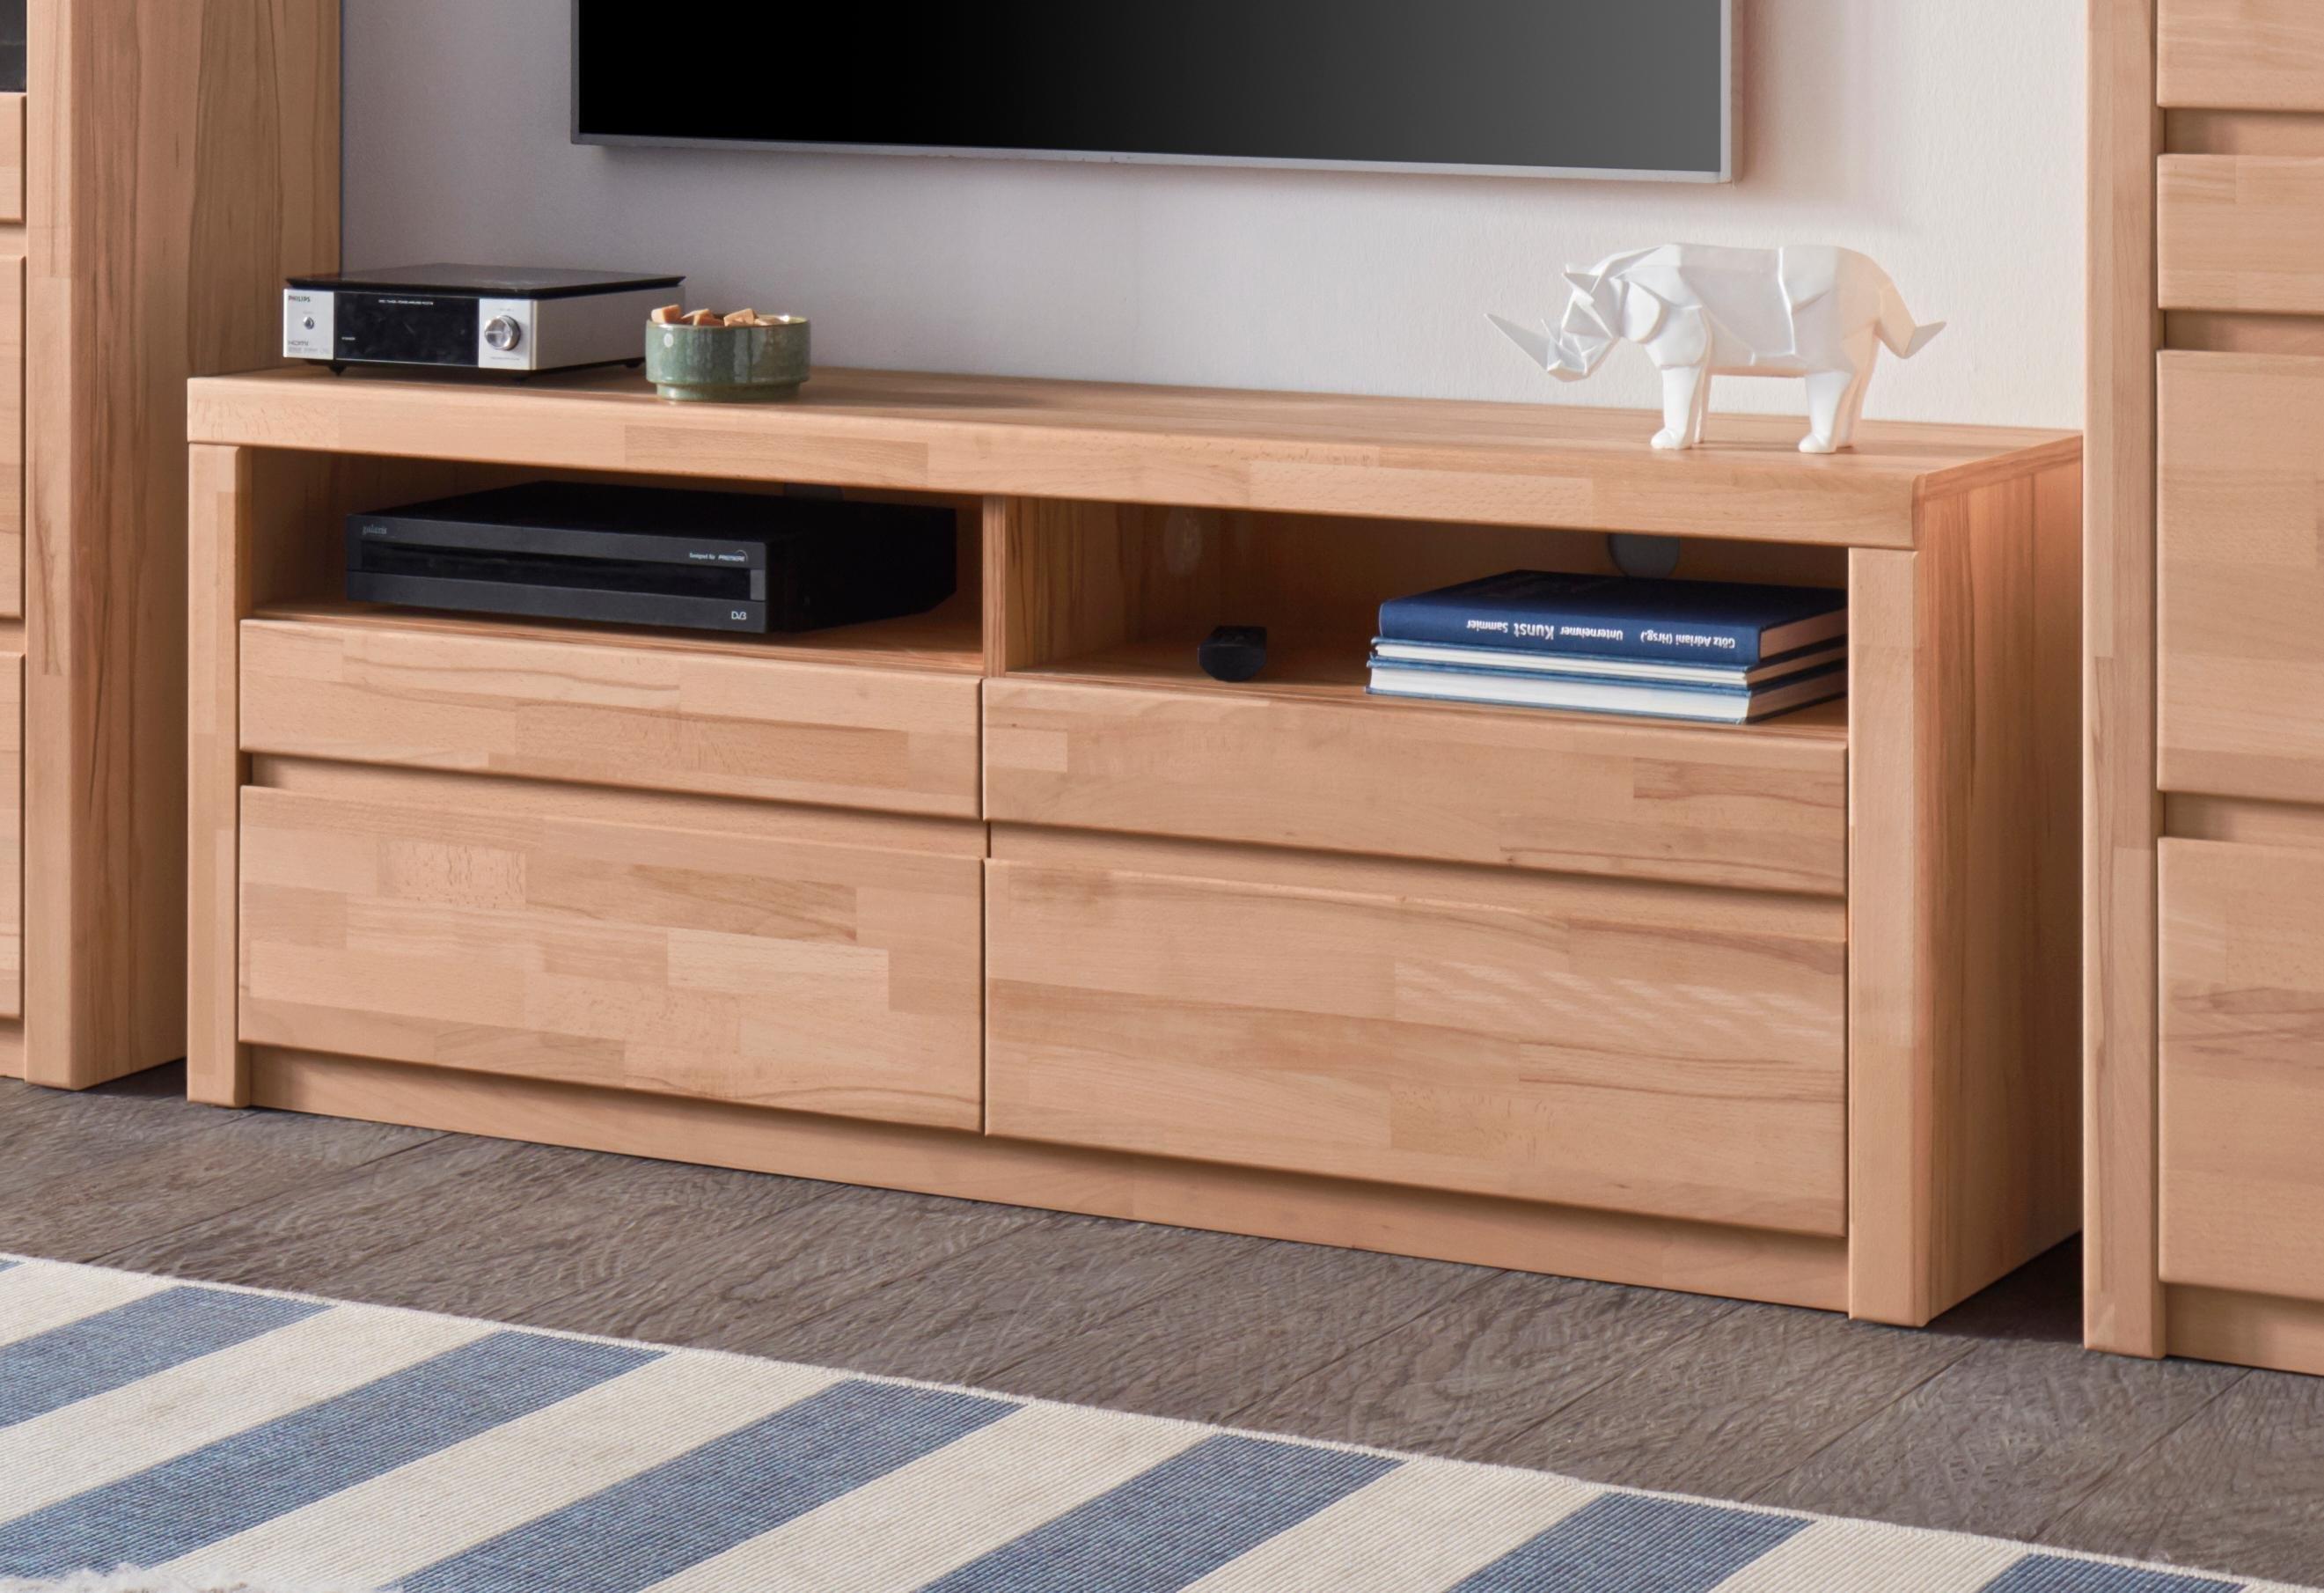 Woltra tv-meubel Silkeborg Breedte 140 cm goedkoop op otto.nl kopen